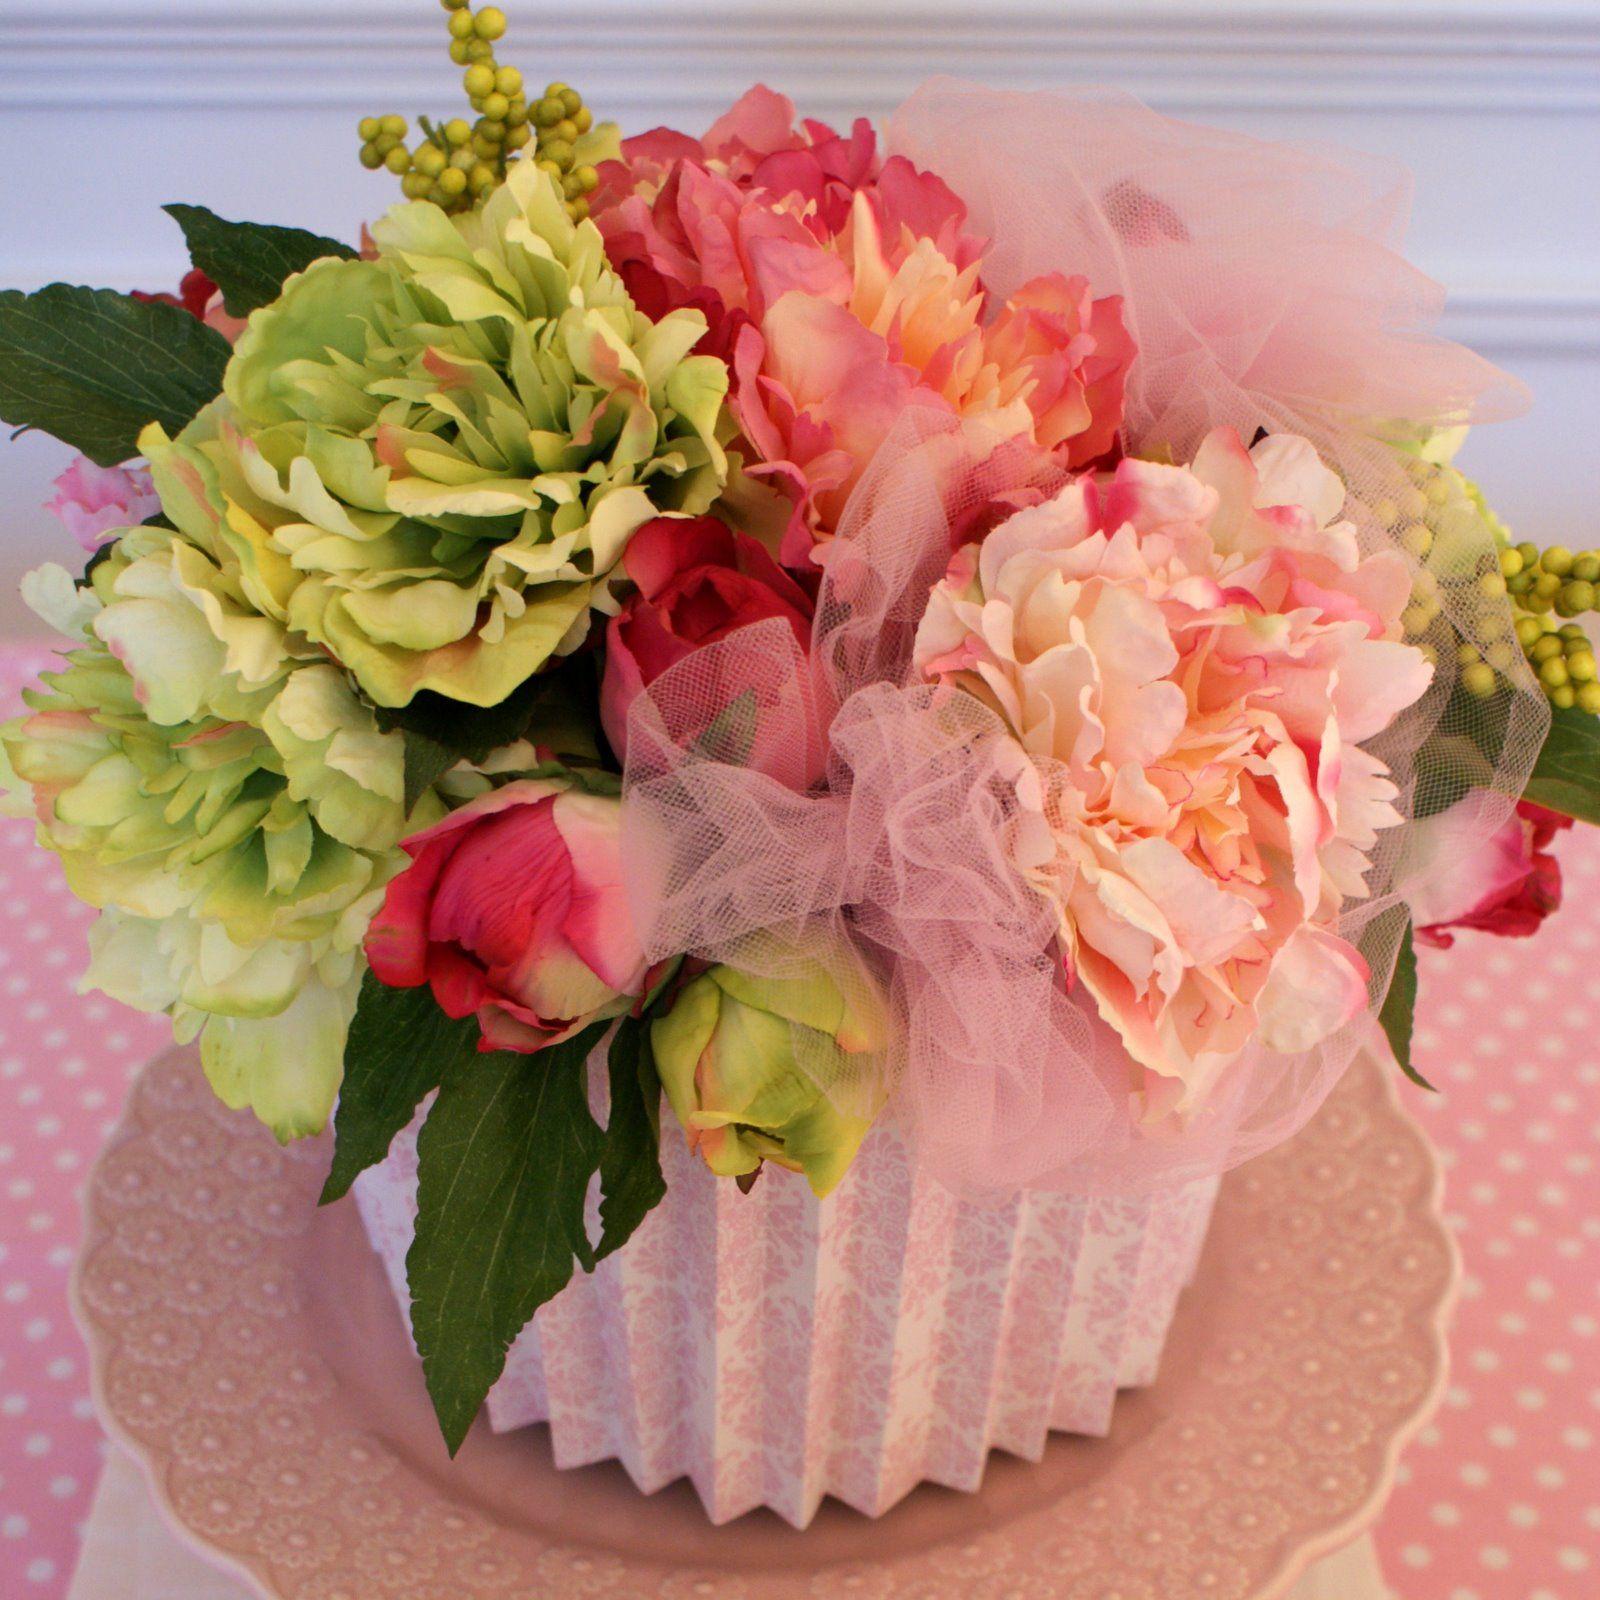 flower cake arrangements birthday 100 images happy birthday